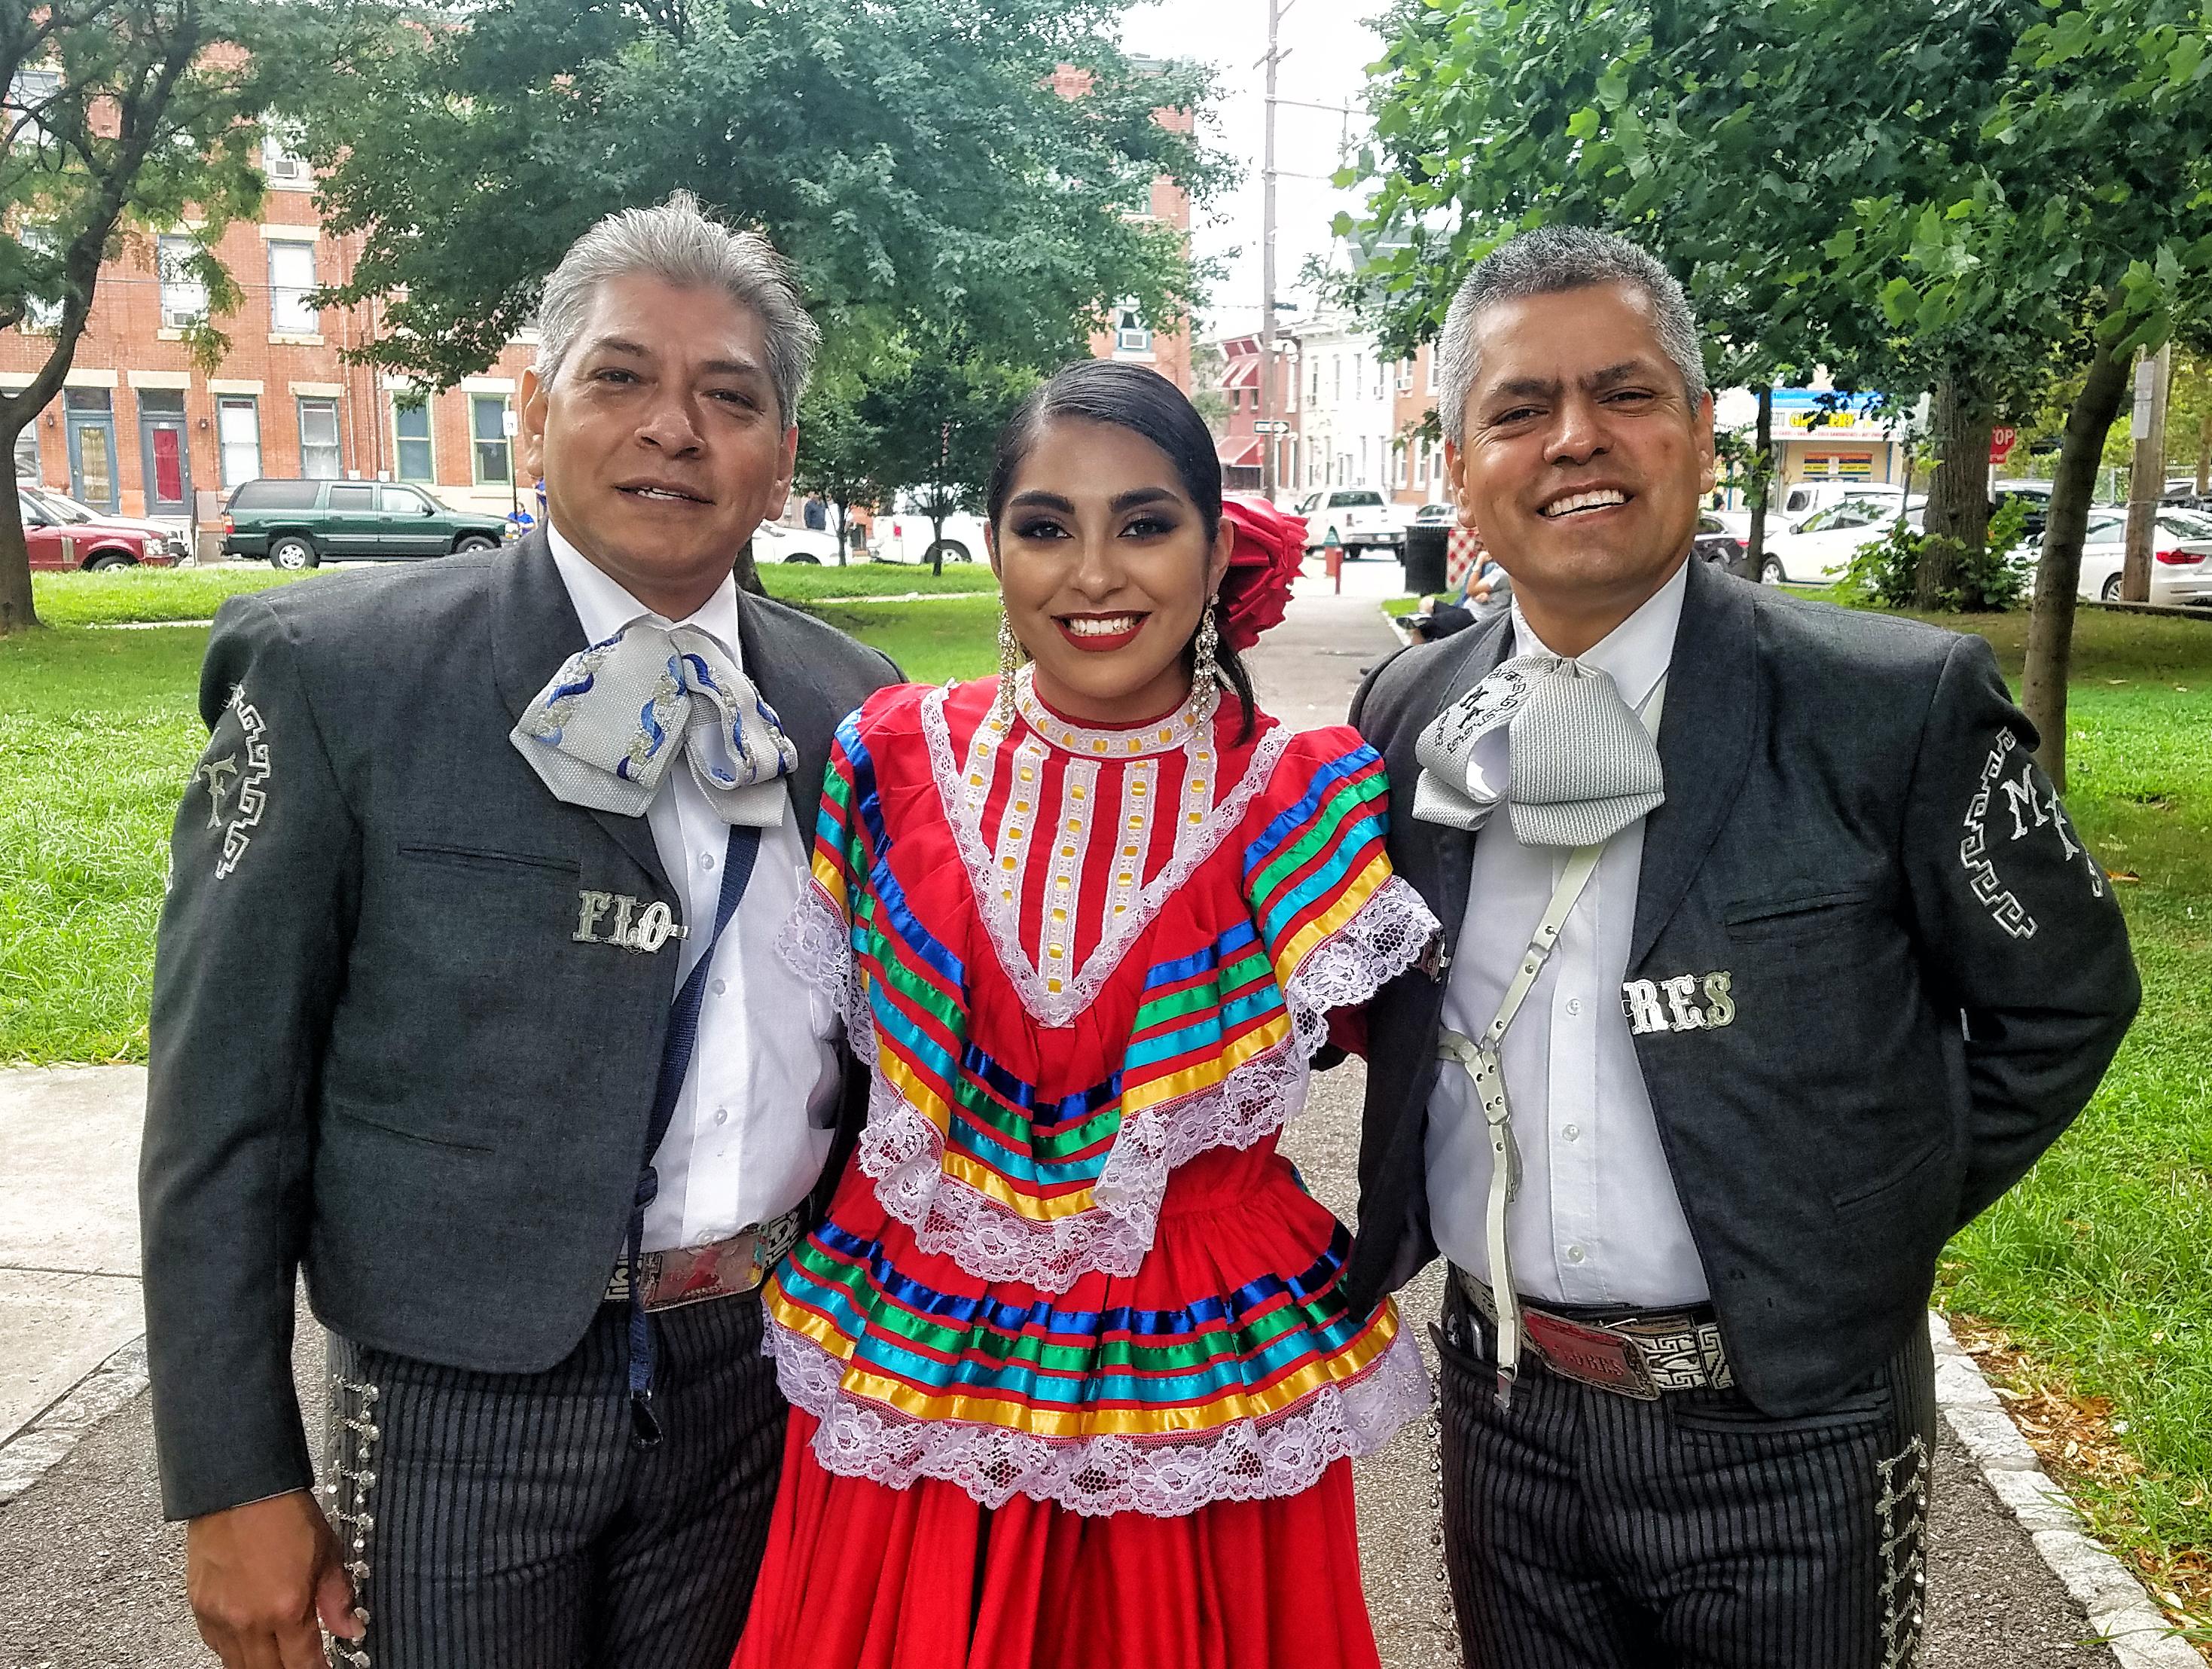 Fiesta Caibeña 2017